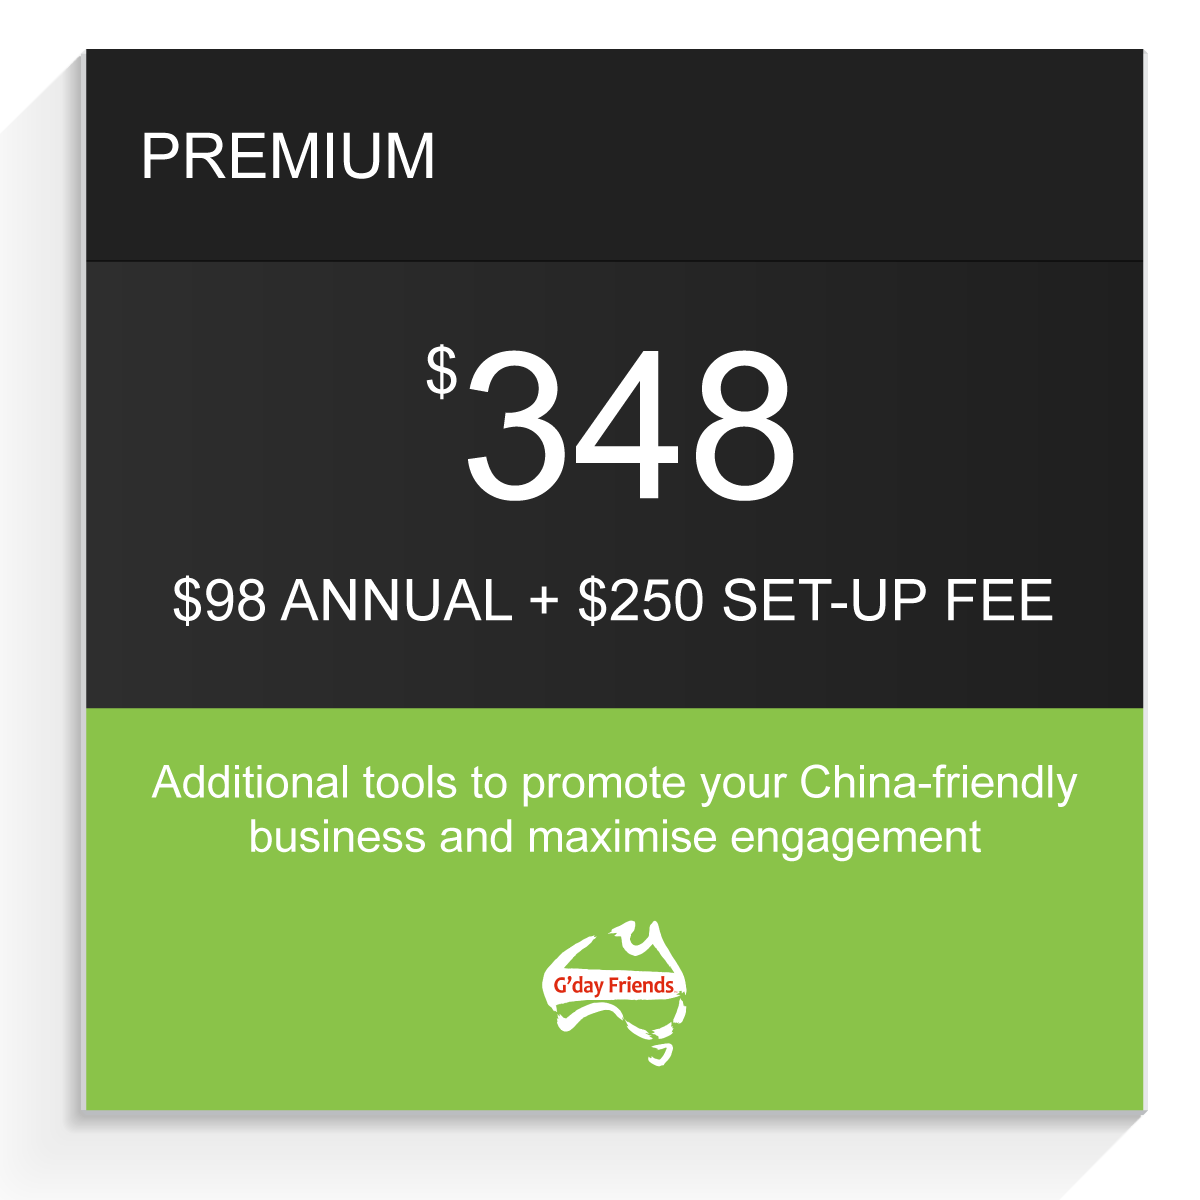 Premium G'day Friends package